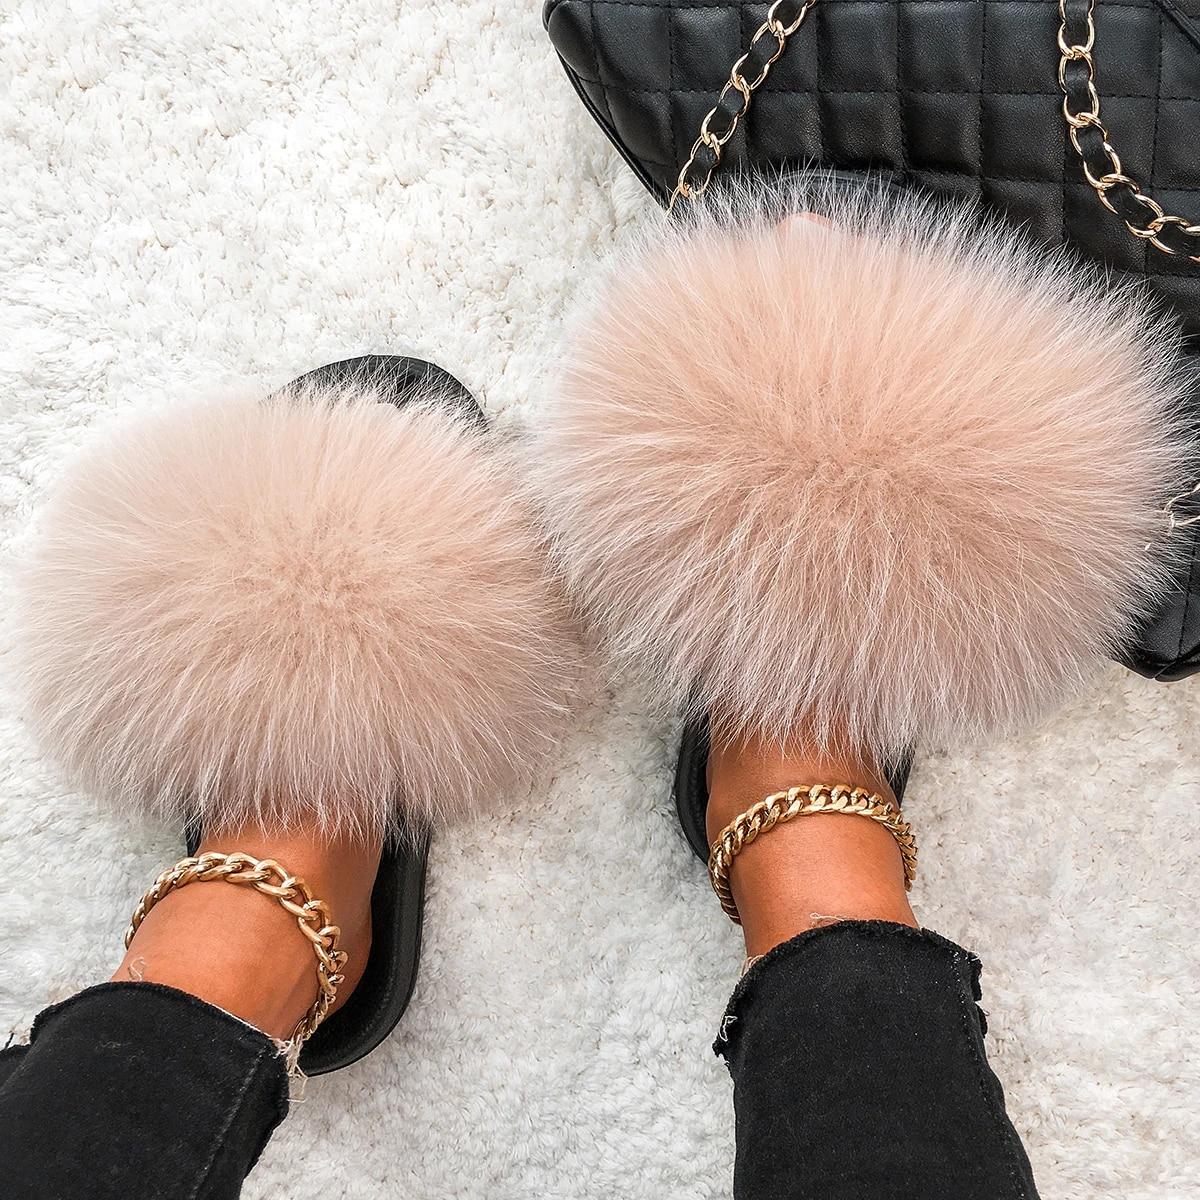 Raccoon Fur Slippers Plush Fox Fur Slides Flip Flops Sandals Cute Shoes,Orange Fox Fur,9.5